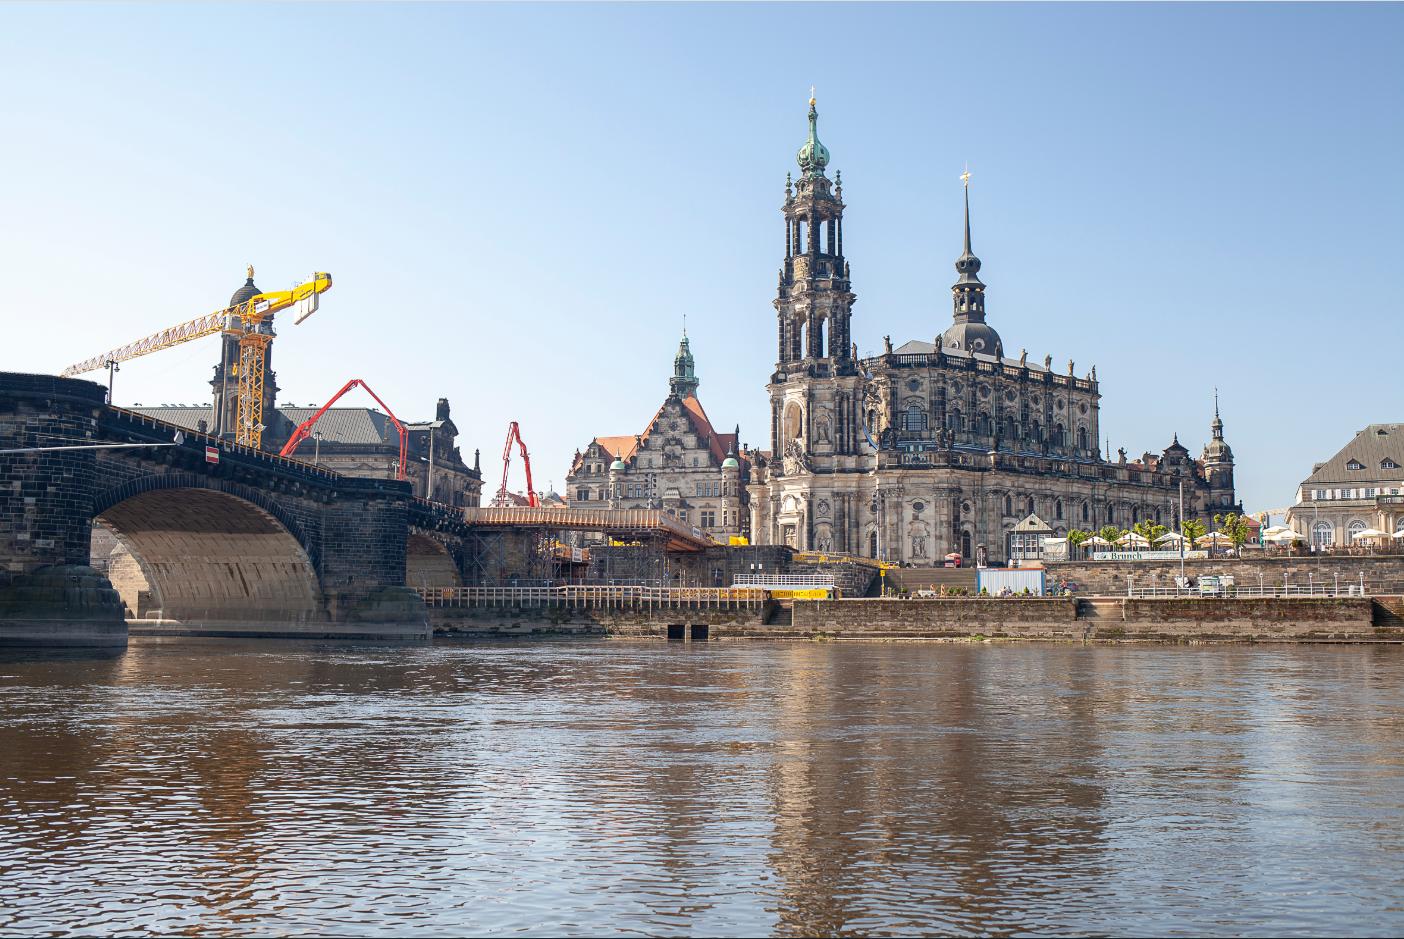 Rund 4.000 m³ Transportbeton lieferte CEMEX Deutschland, davon 500 m³ farbiger Beton. (Foto: CEMEX Deutschland AG / Sebastian Lechler)